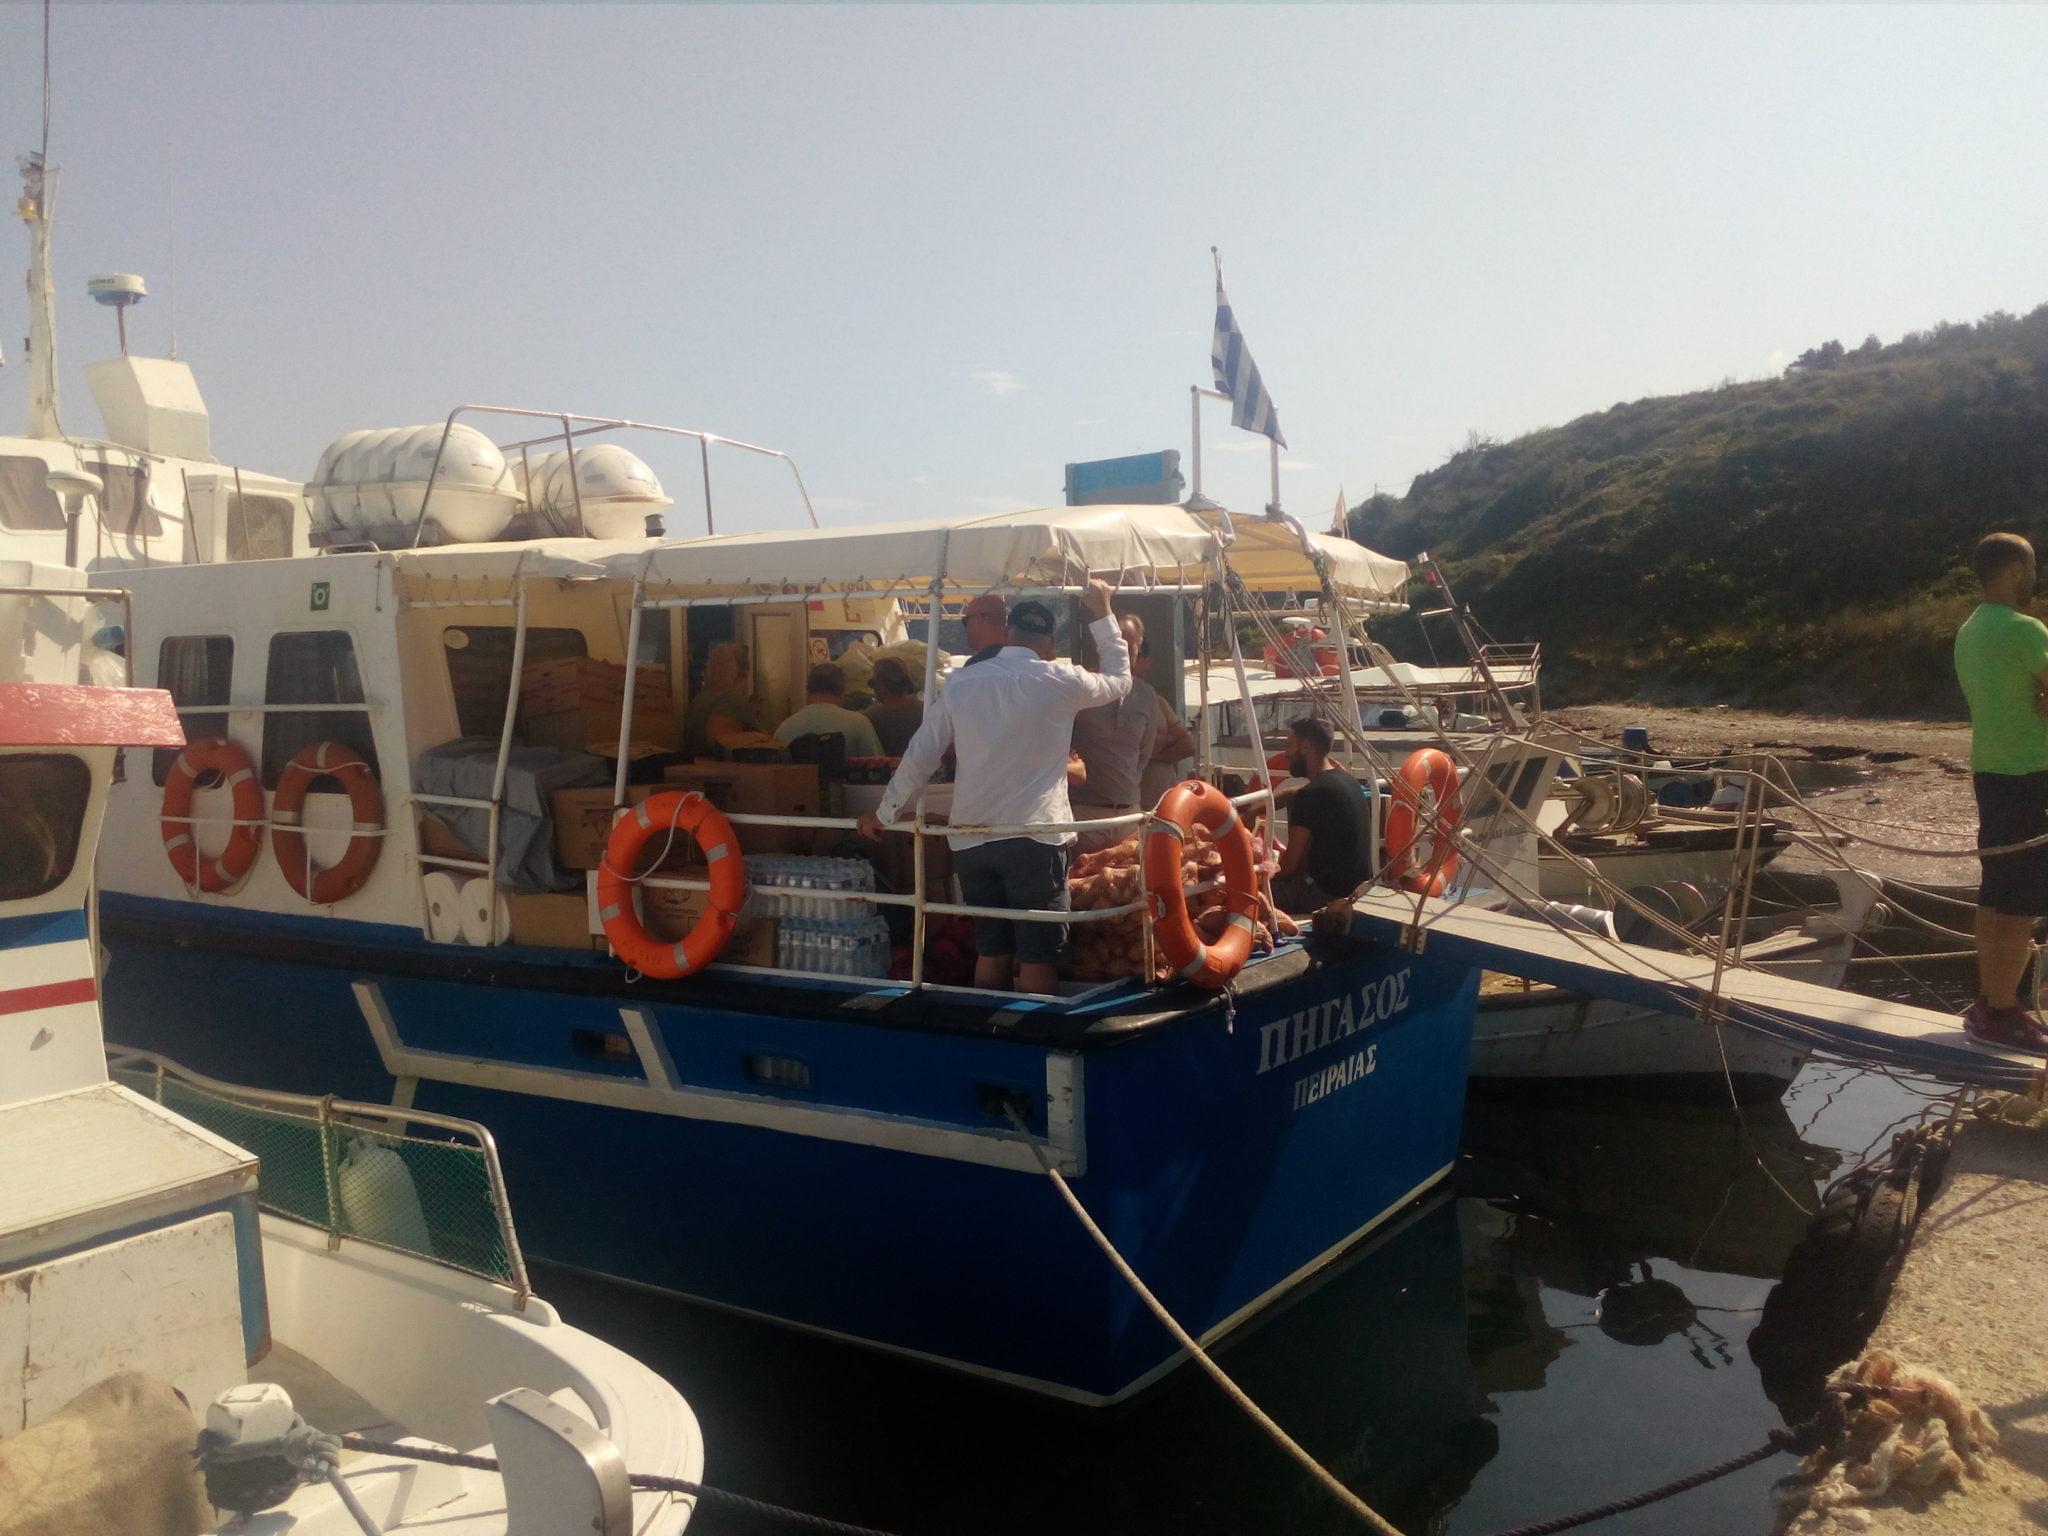 Photo of Υπ.Εμπορικής Ναυτιλιας και Αντιδήμαρχοι Διαποντίων Νησιών Κέρκυρας και βουλευτές  δεν έδωσαν λύση στην θαλάσσια σύνδεση τους. ΦΩΤΟ & 3 VIDEO